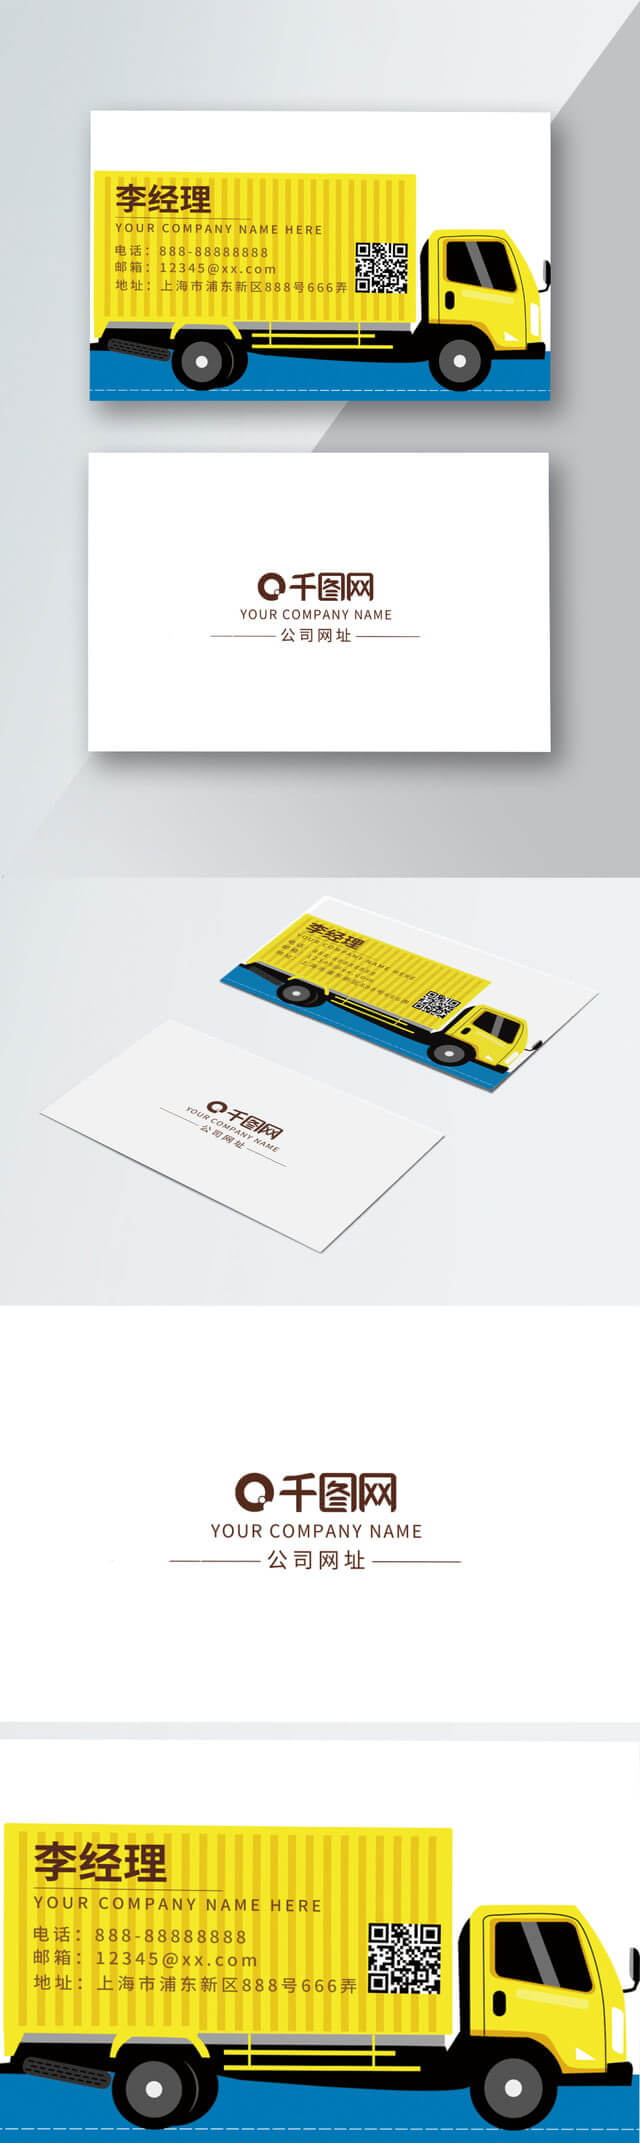 Truck Transportation Business Card Undertake Freight With Regard To Transport Business Cards Templates Free